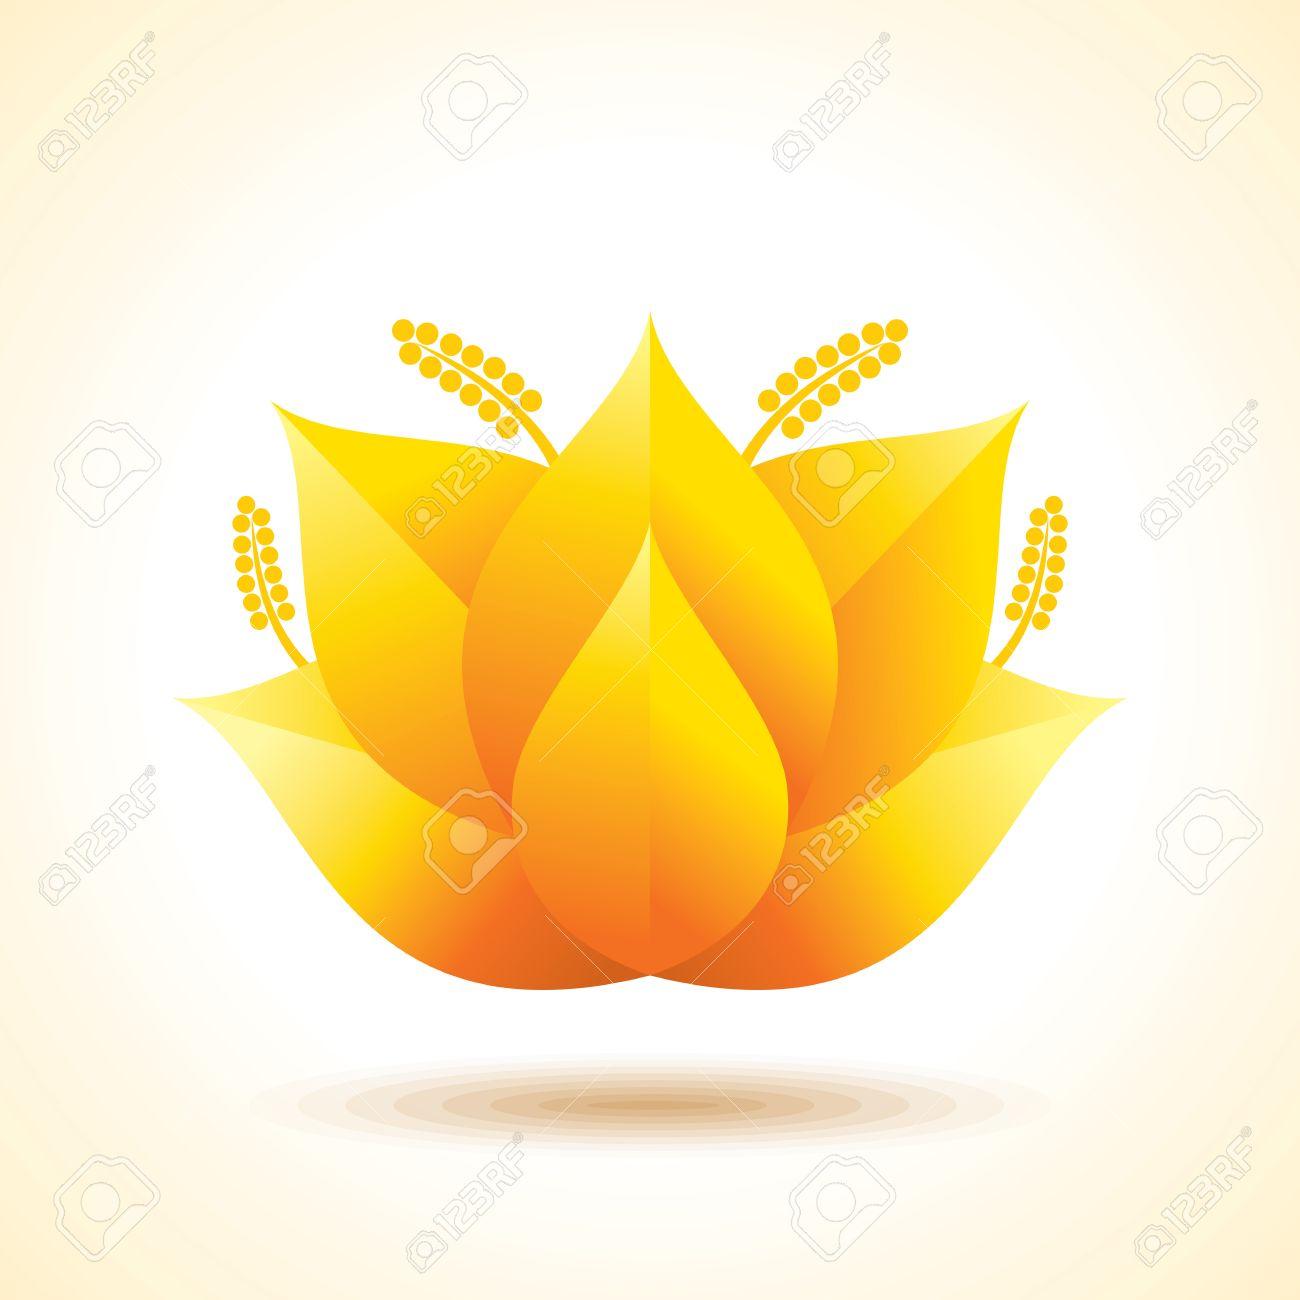 Health Spa Creative Idea Lotus Flower Abstract Design Template